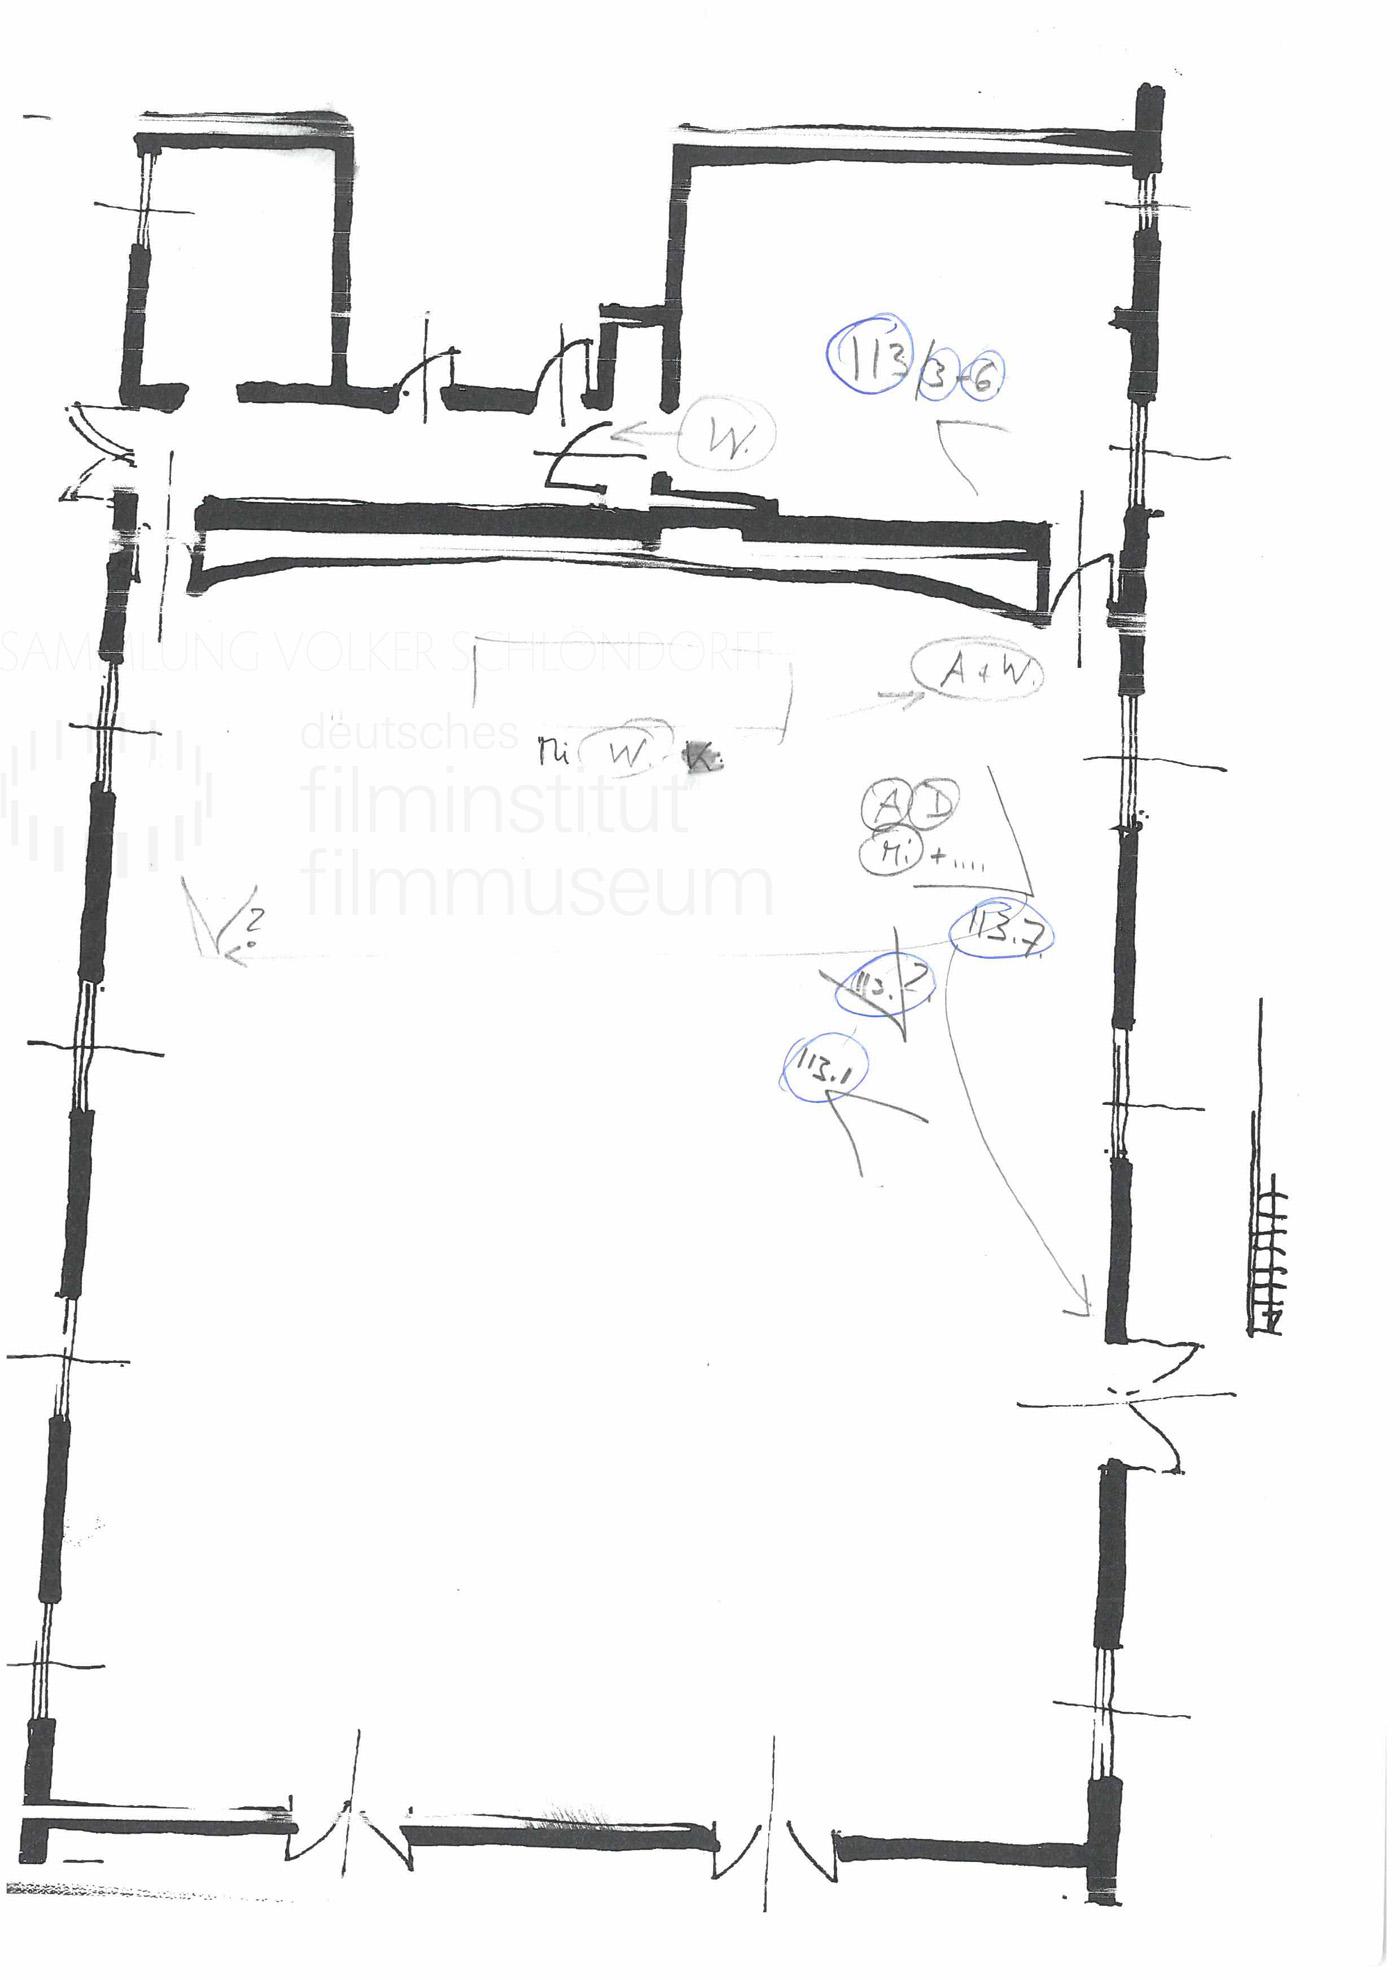 STRAJK // Produktionsmaterial / Skizze, 1d